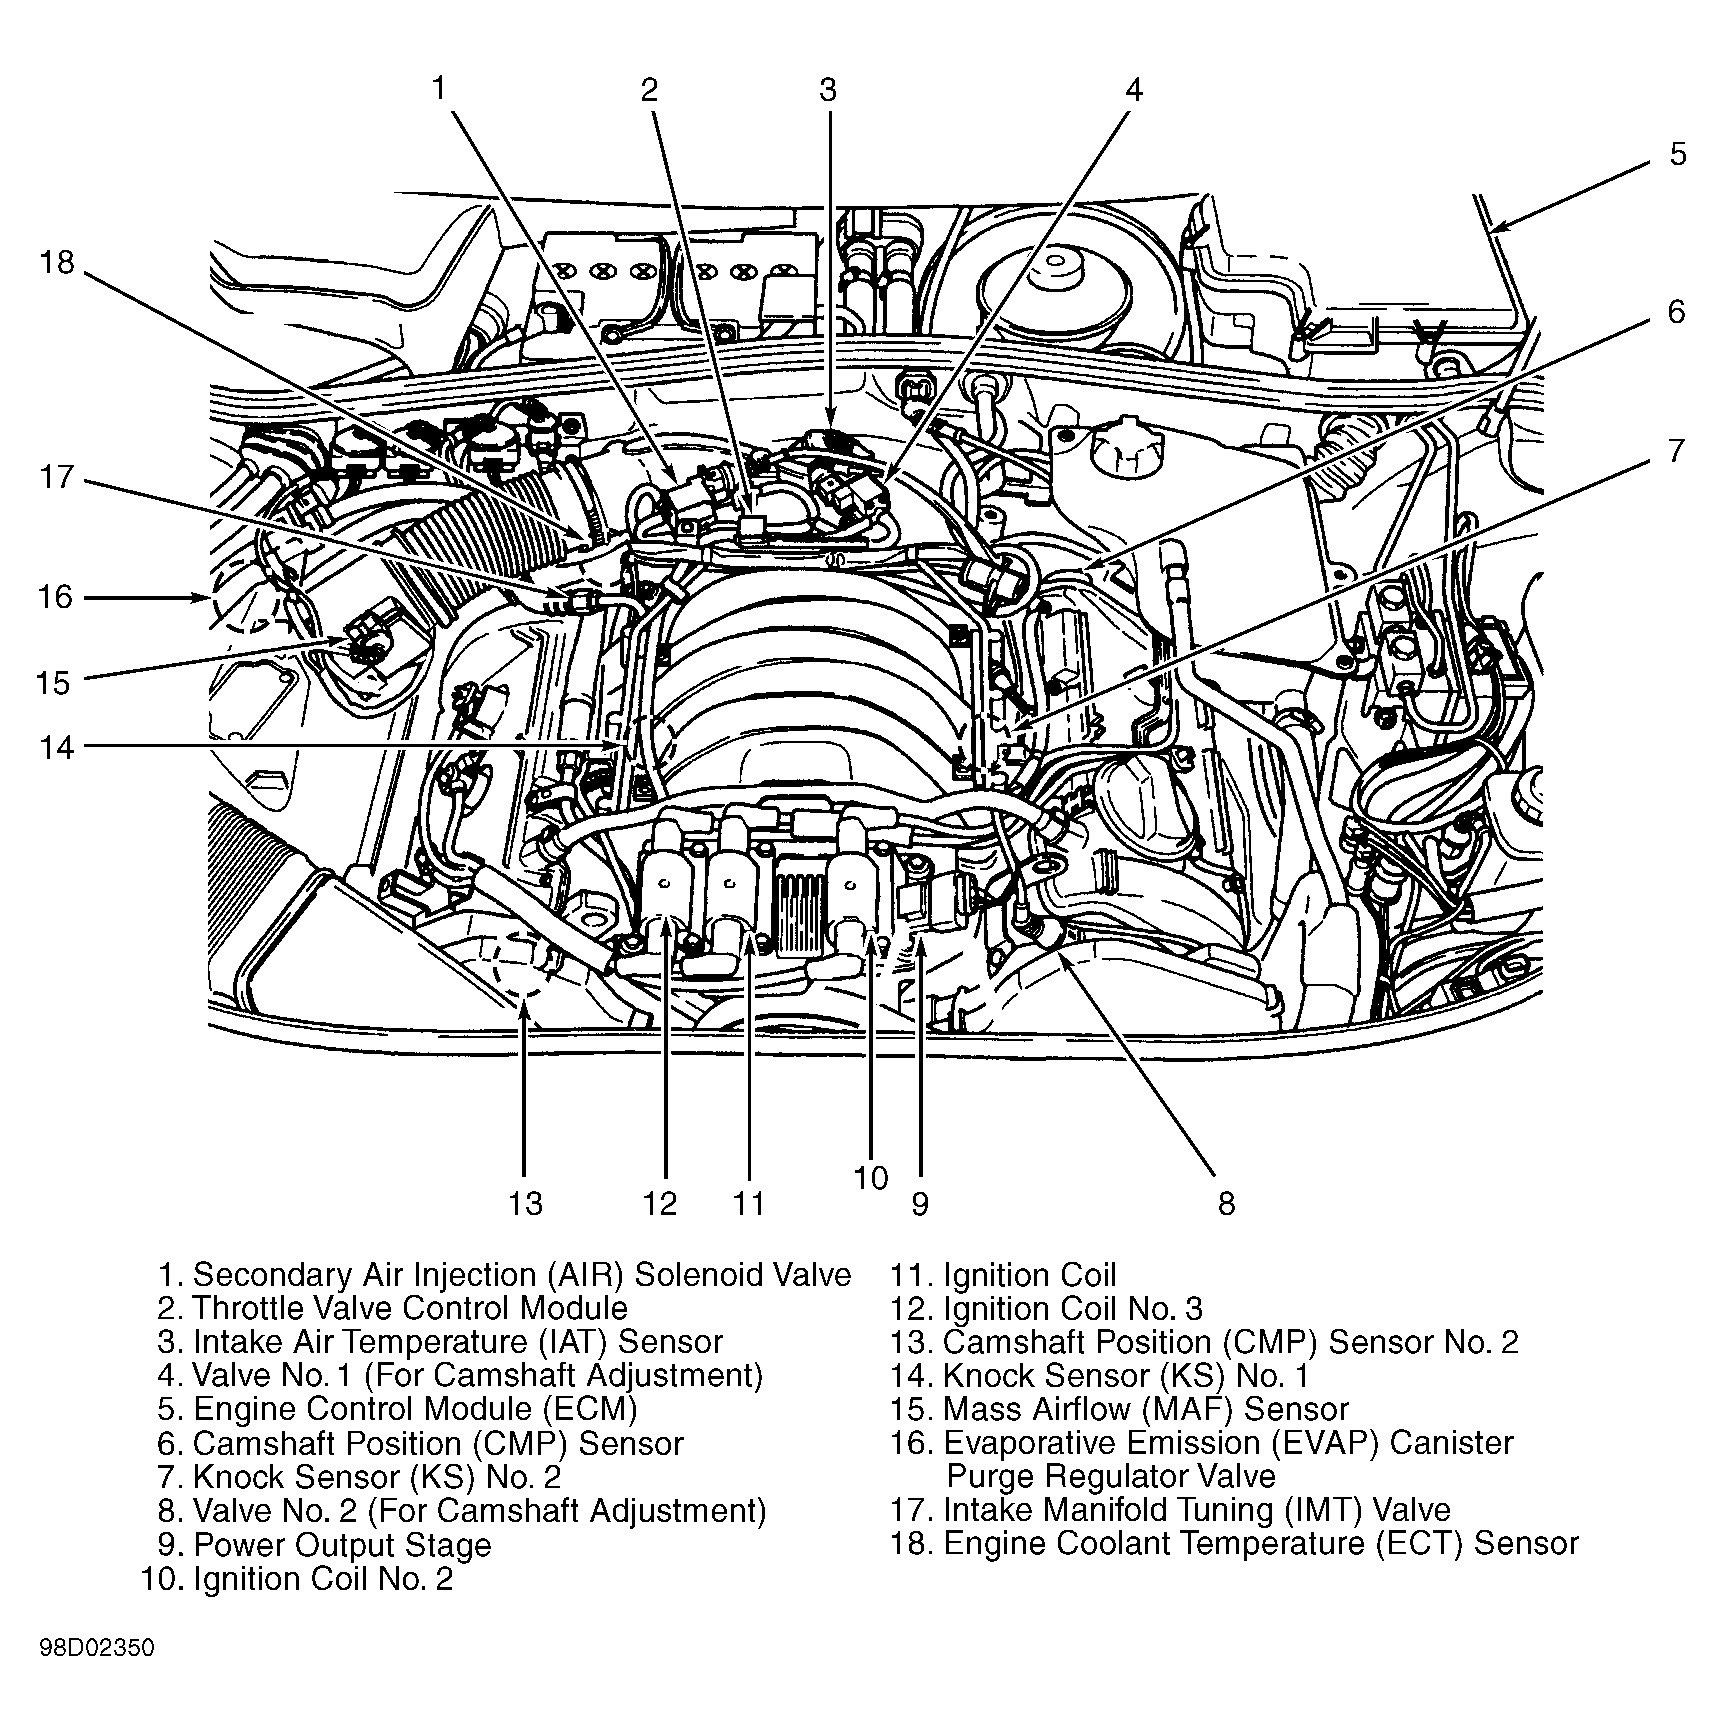 2001 Audi S4 Engine Diagram - wiring diagram power-venus -  power-venus.hoteloctavia.it | Audi B5 S4 Engine Bay Diagram |  | hoteloctavia.it